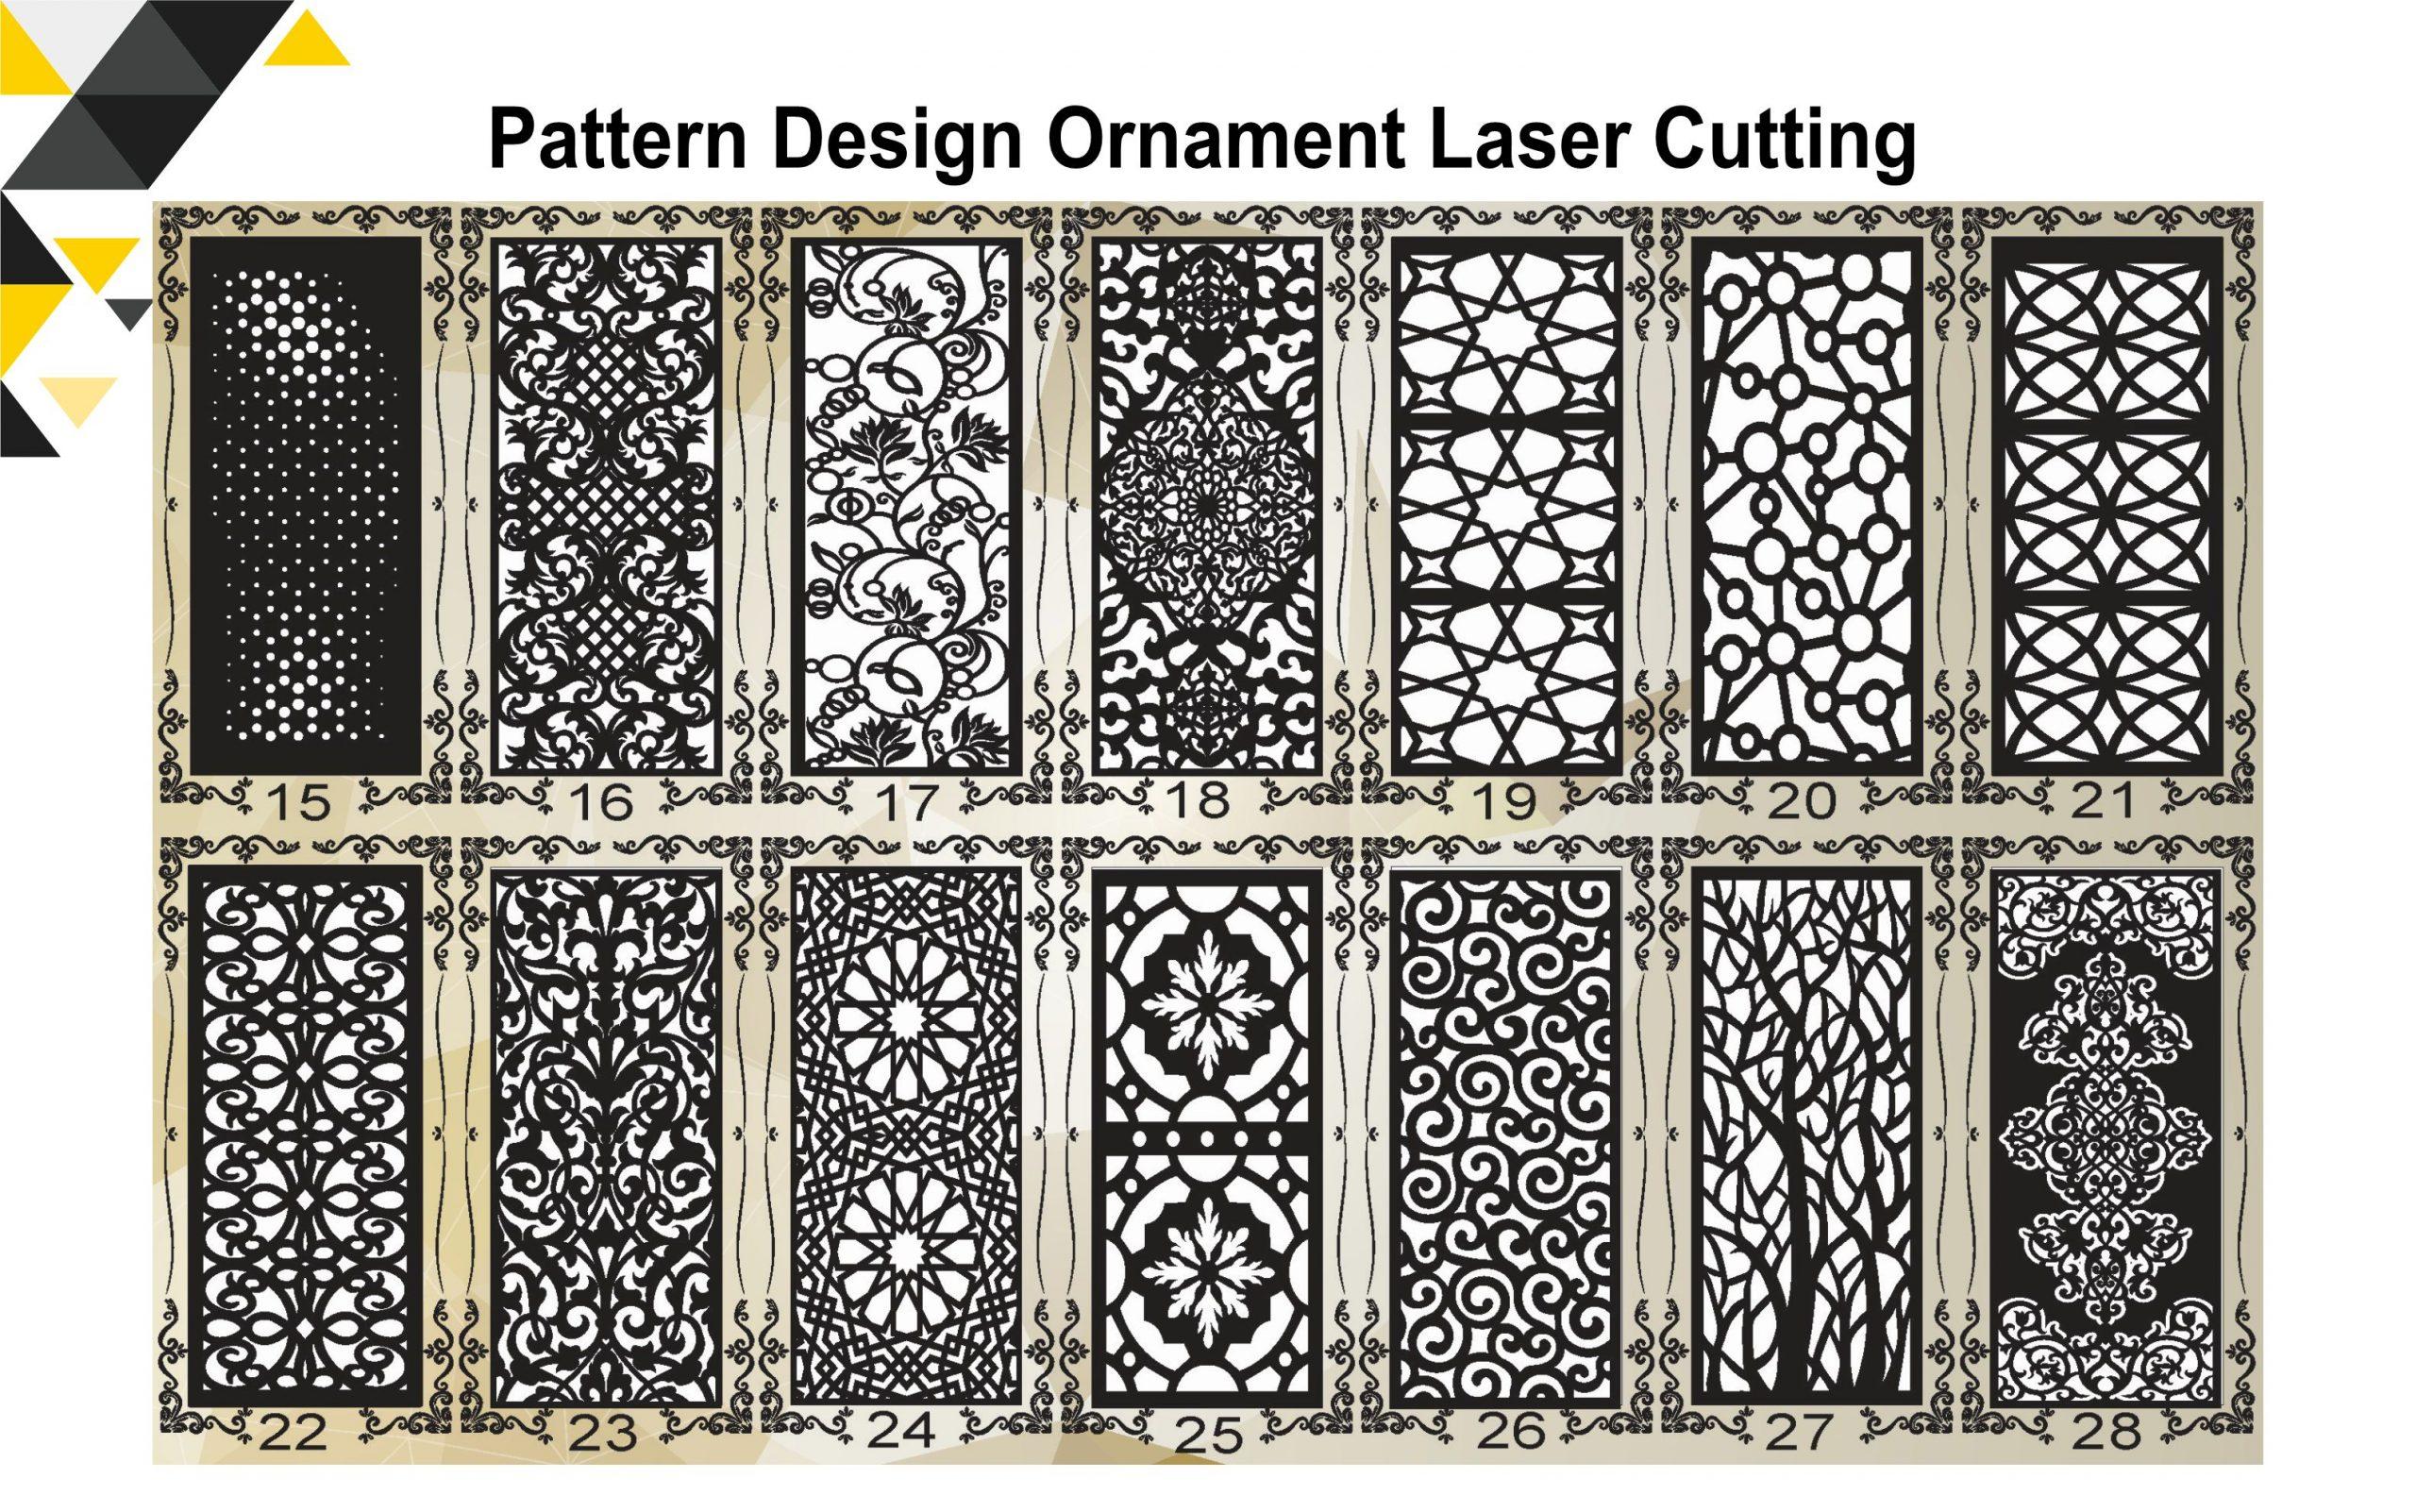 Pattern Design Ornament2